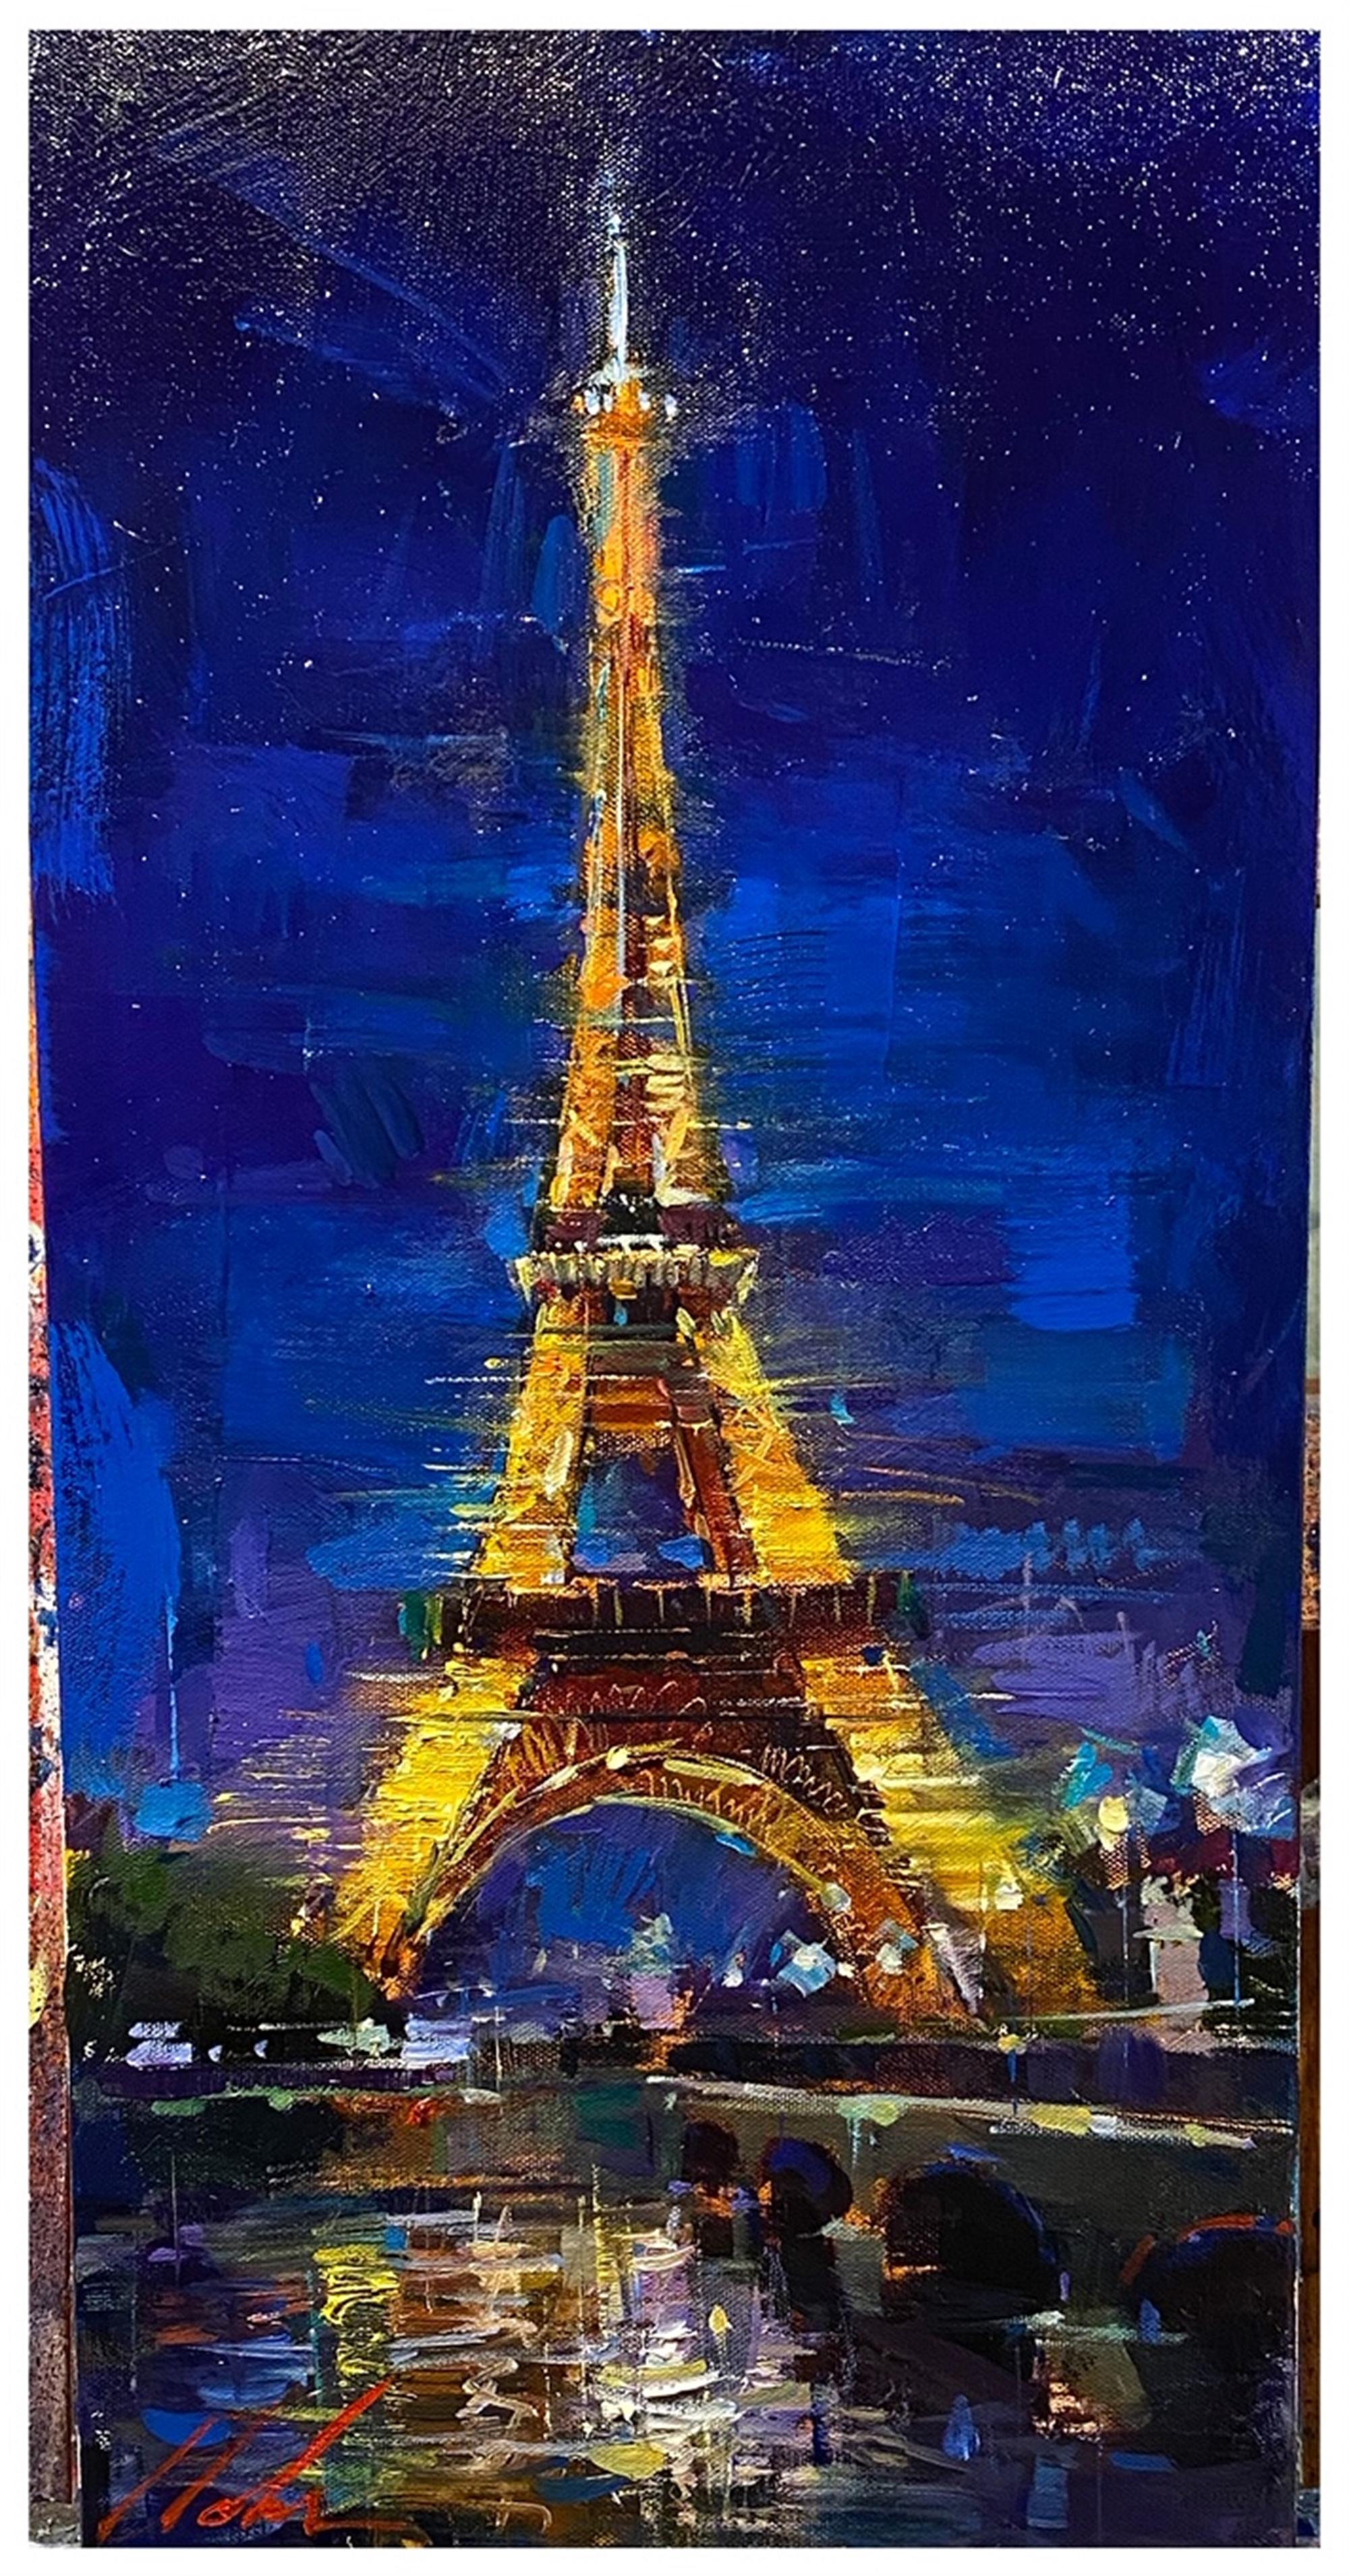 City of Romance by Michael Flohr